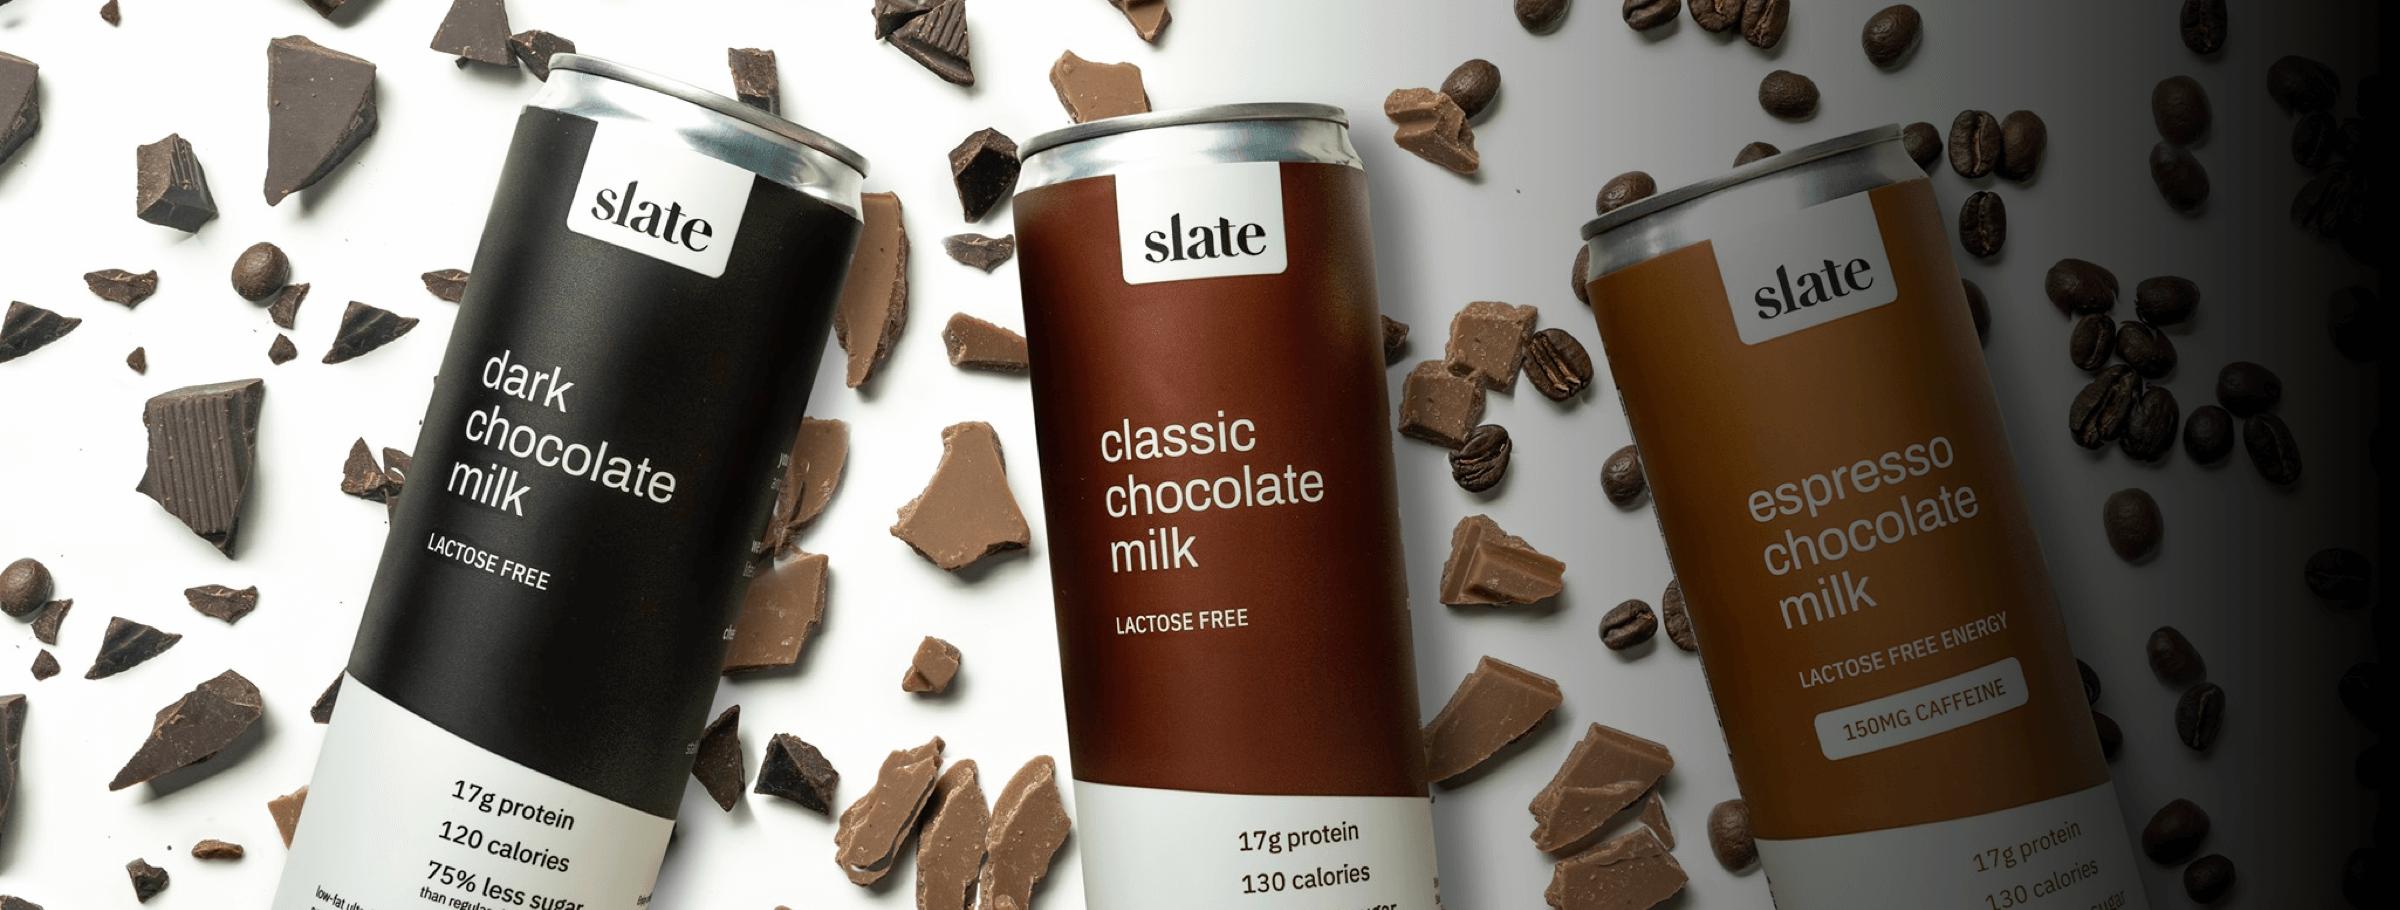 Case Study: Slate Milk